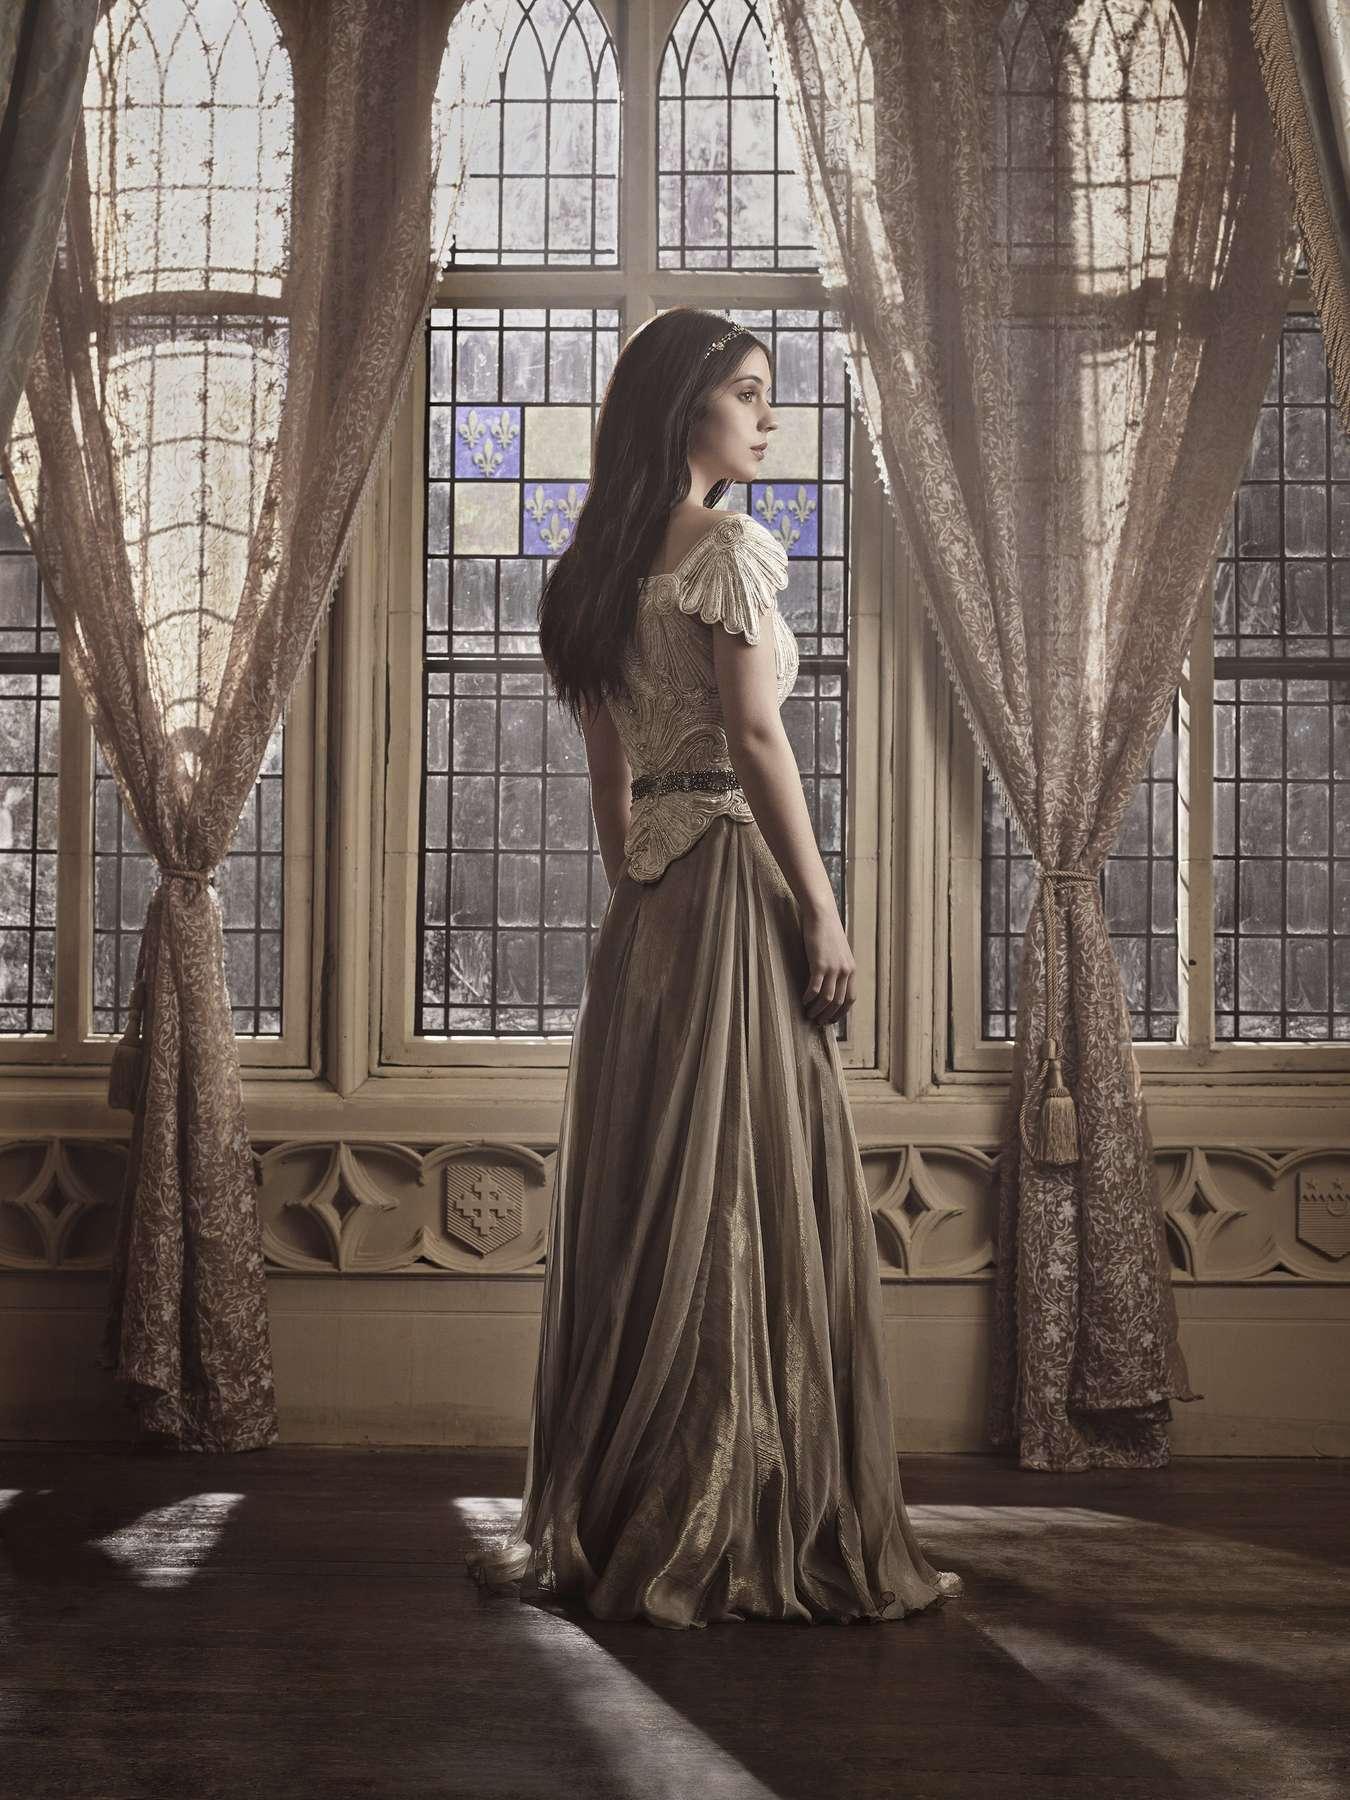 Adelaide Kane Reign Promoshoot